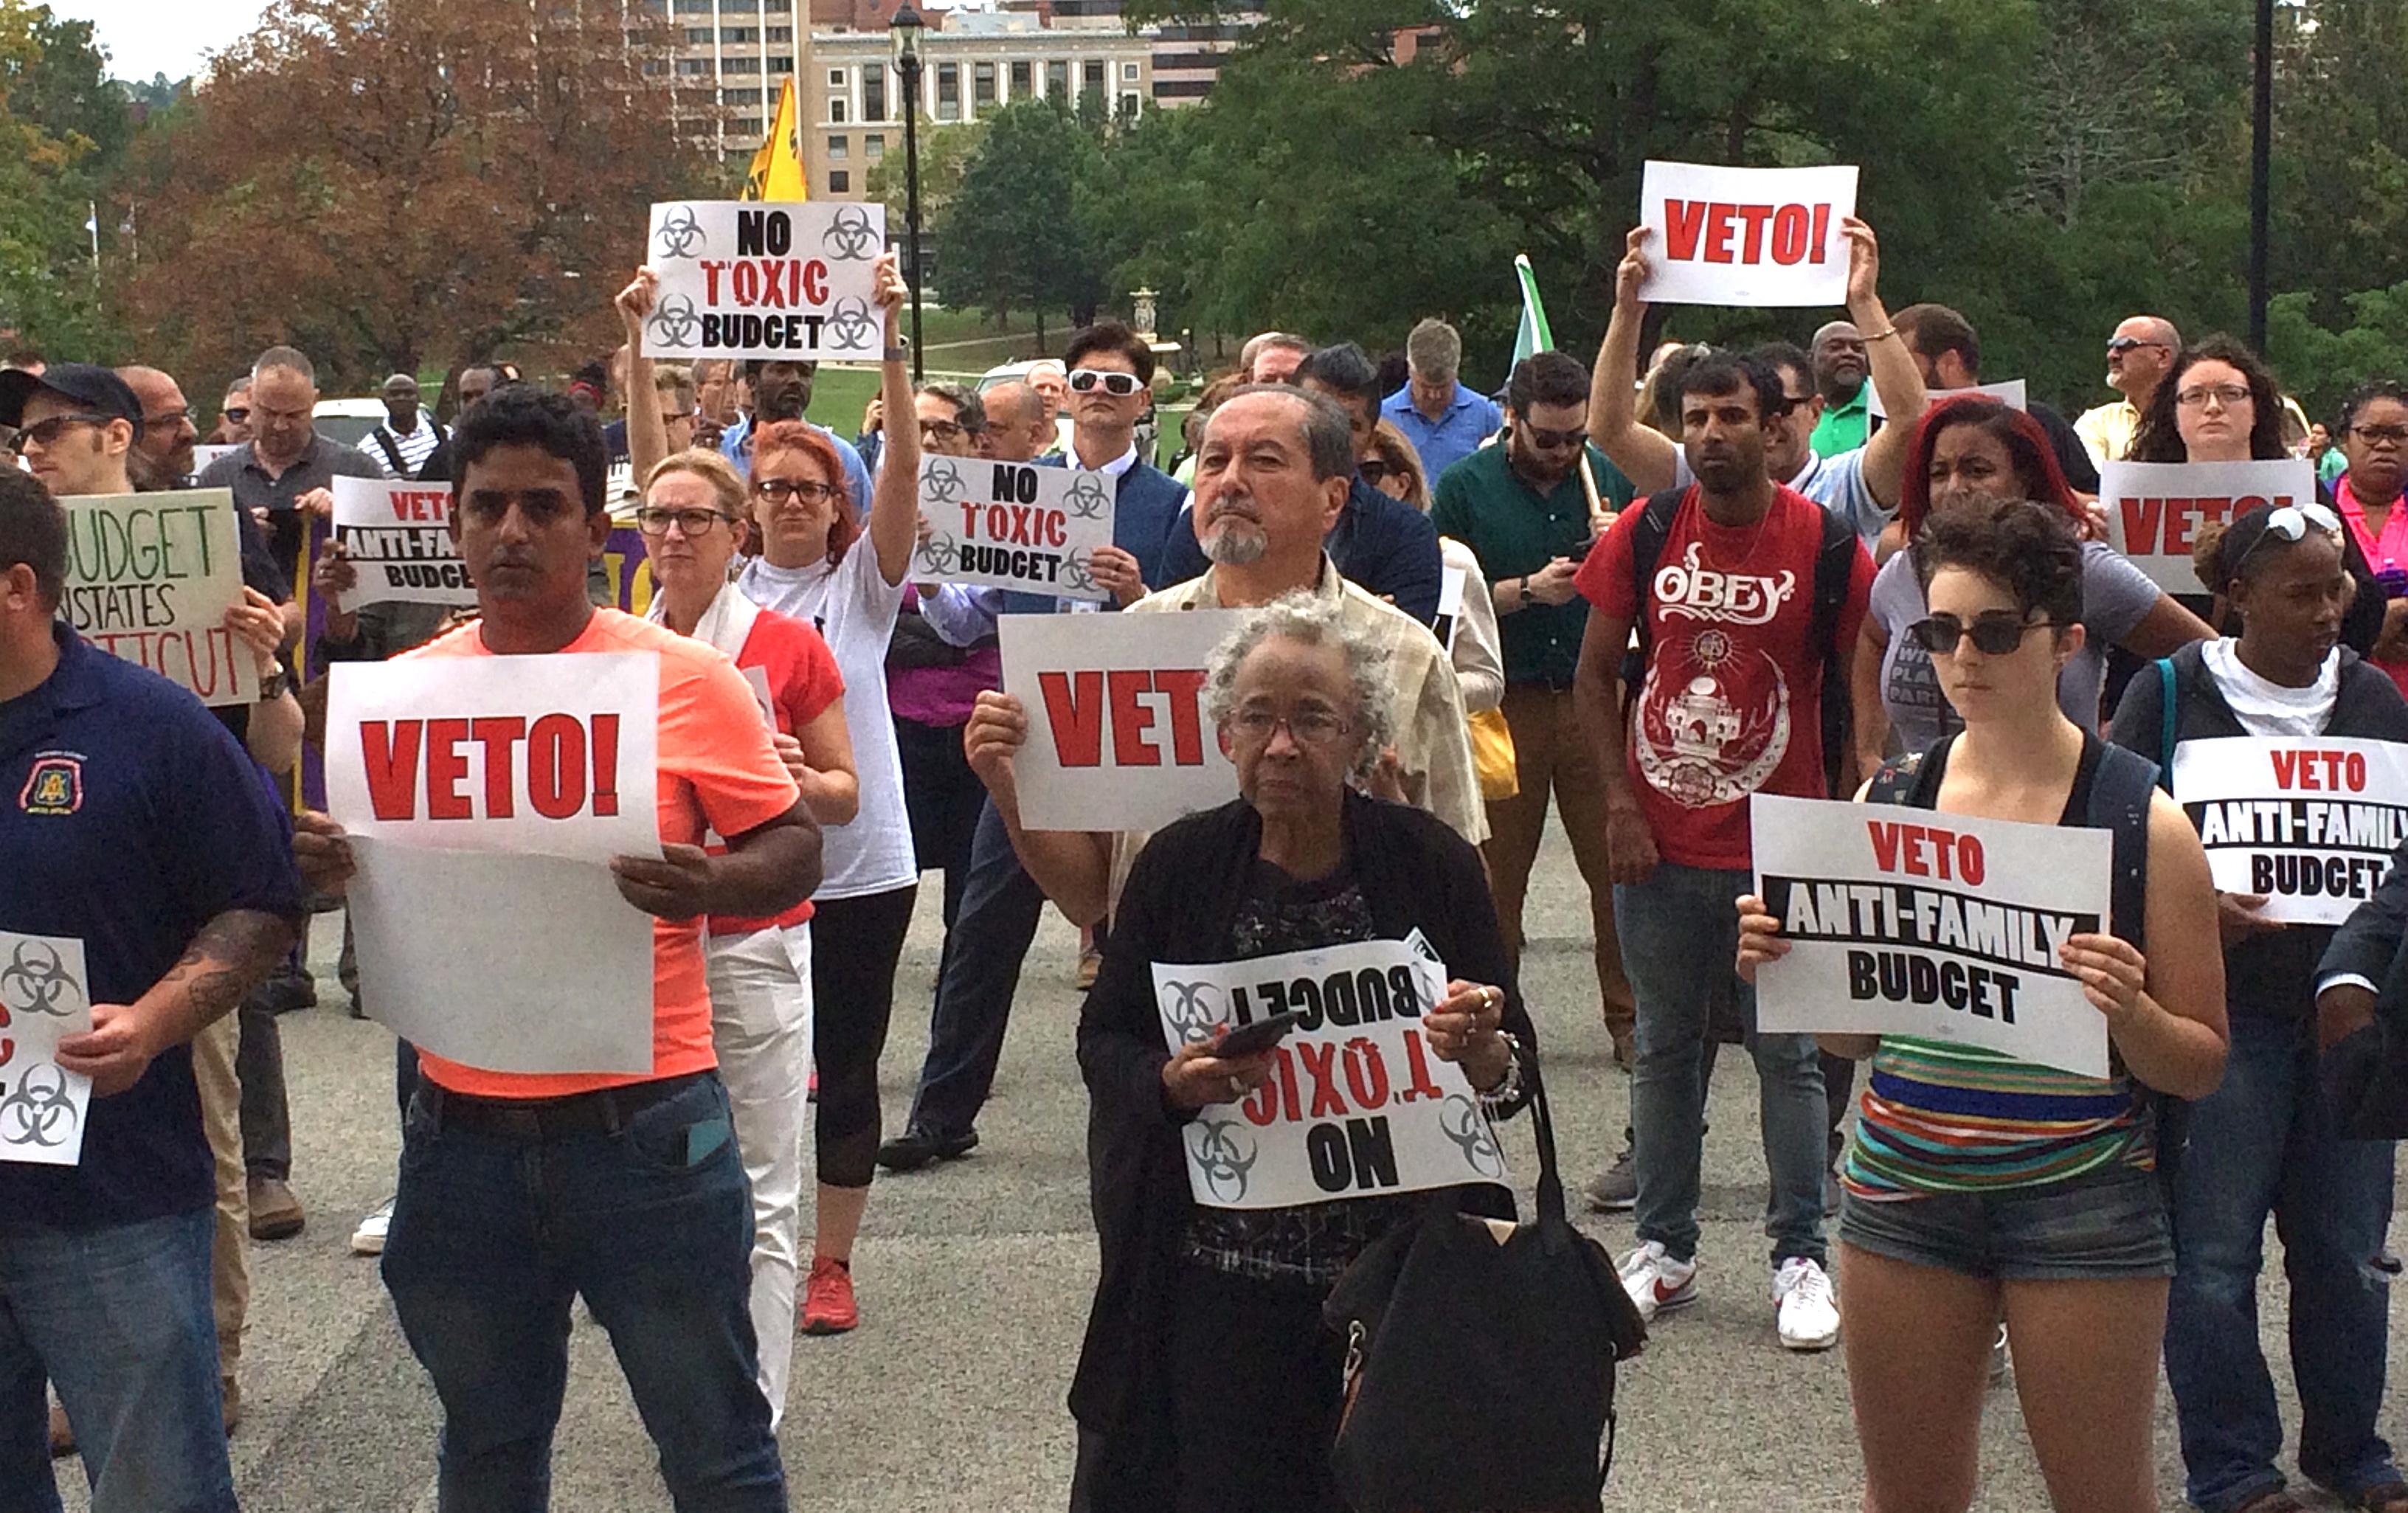 Labor, urban advocates rally to urge Malloy veto of GOP budget